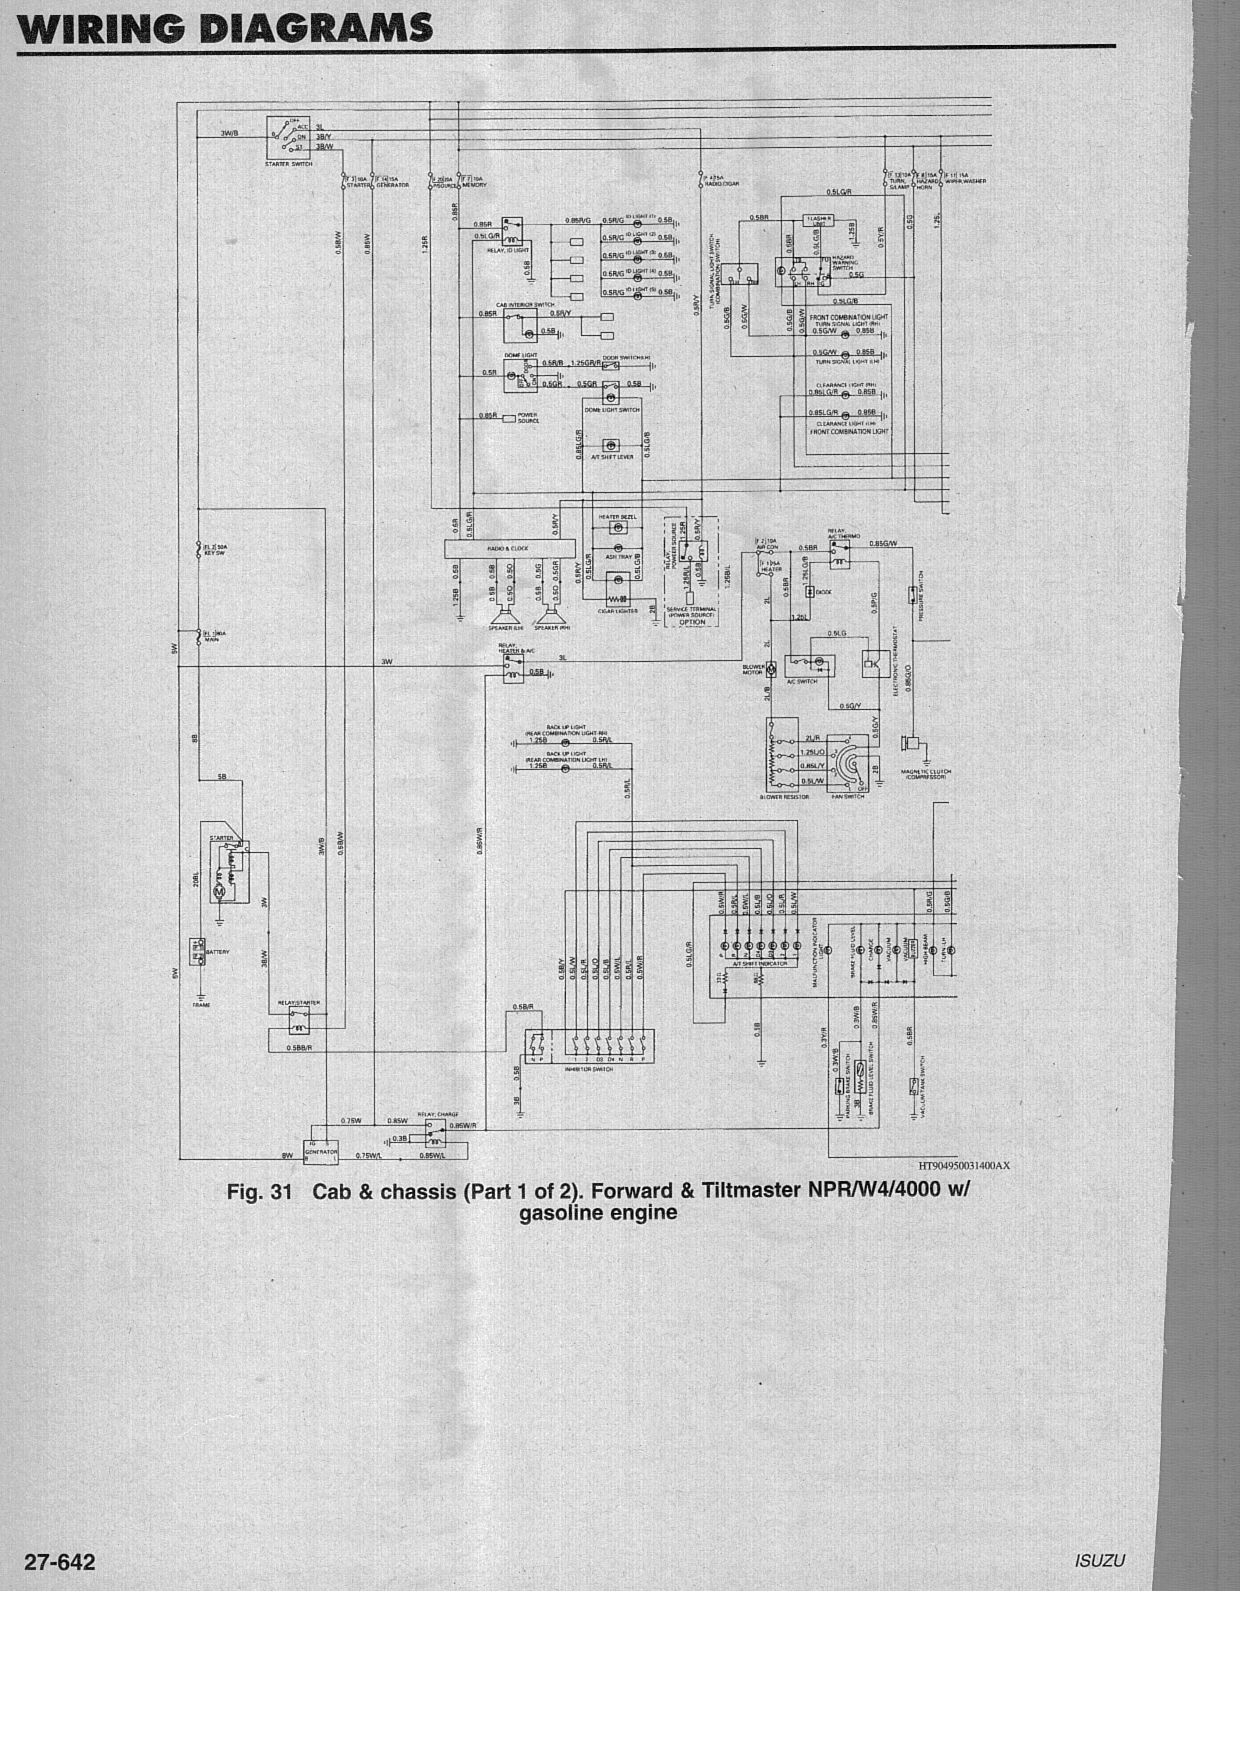 94 Isuzu Npr Wiring Diagram | Manual E-Books - 2006 Isuzu Npr Wiring Diagram